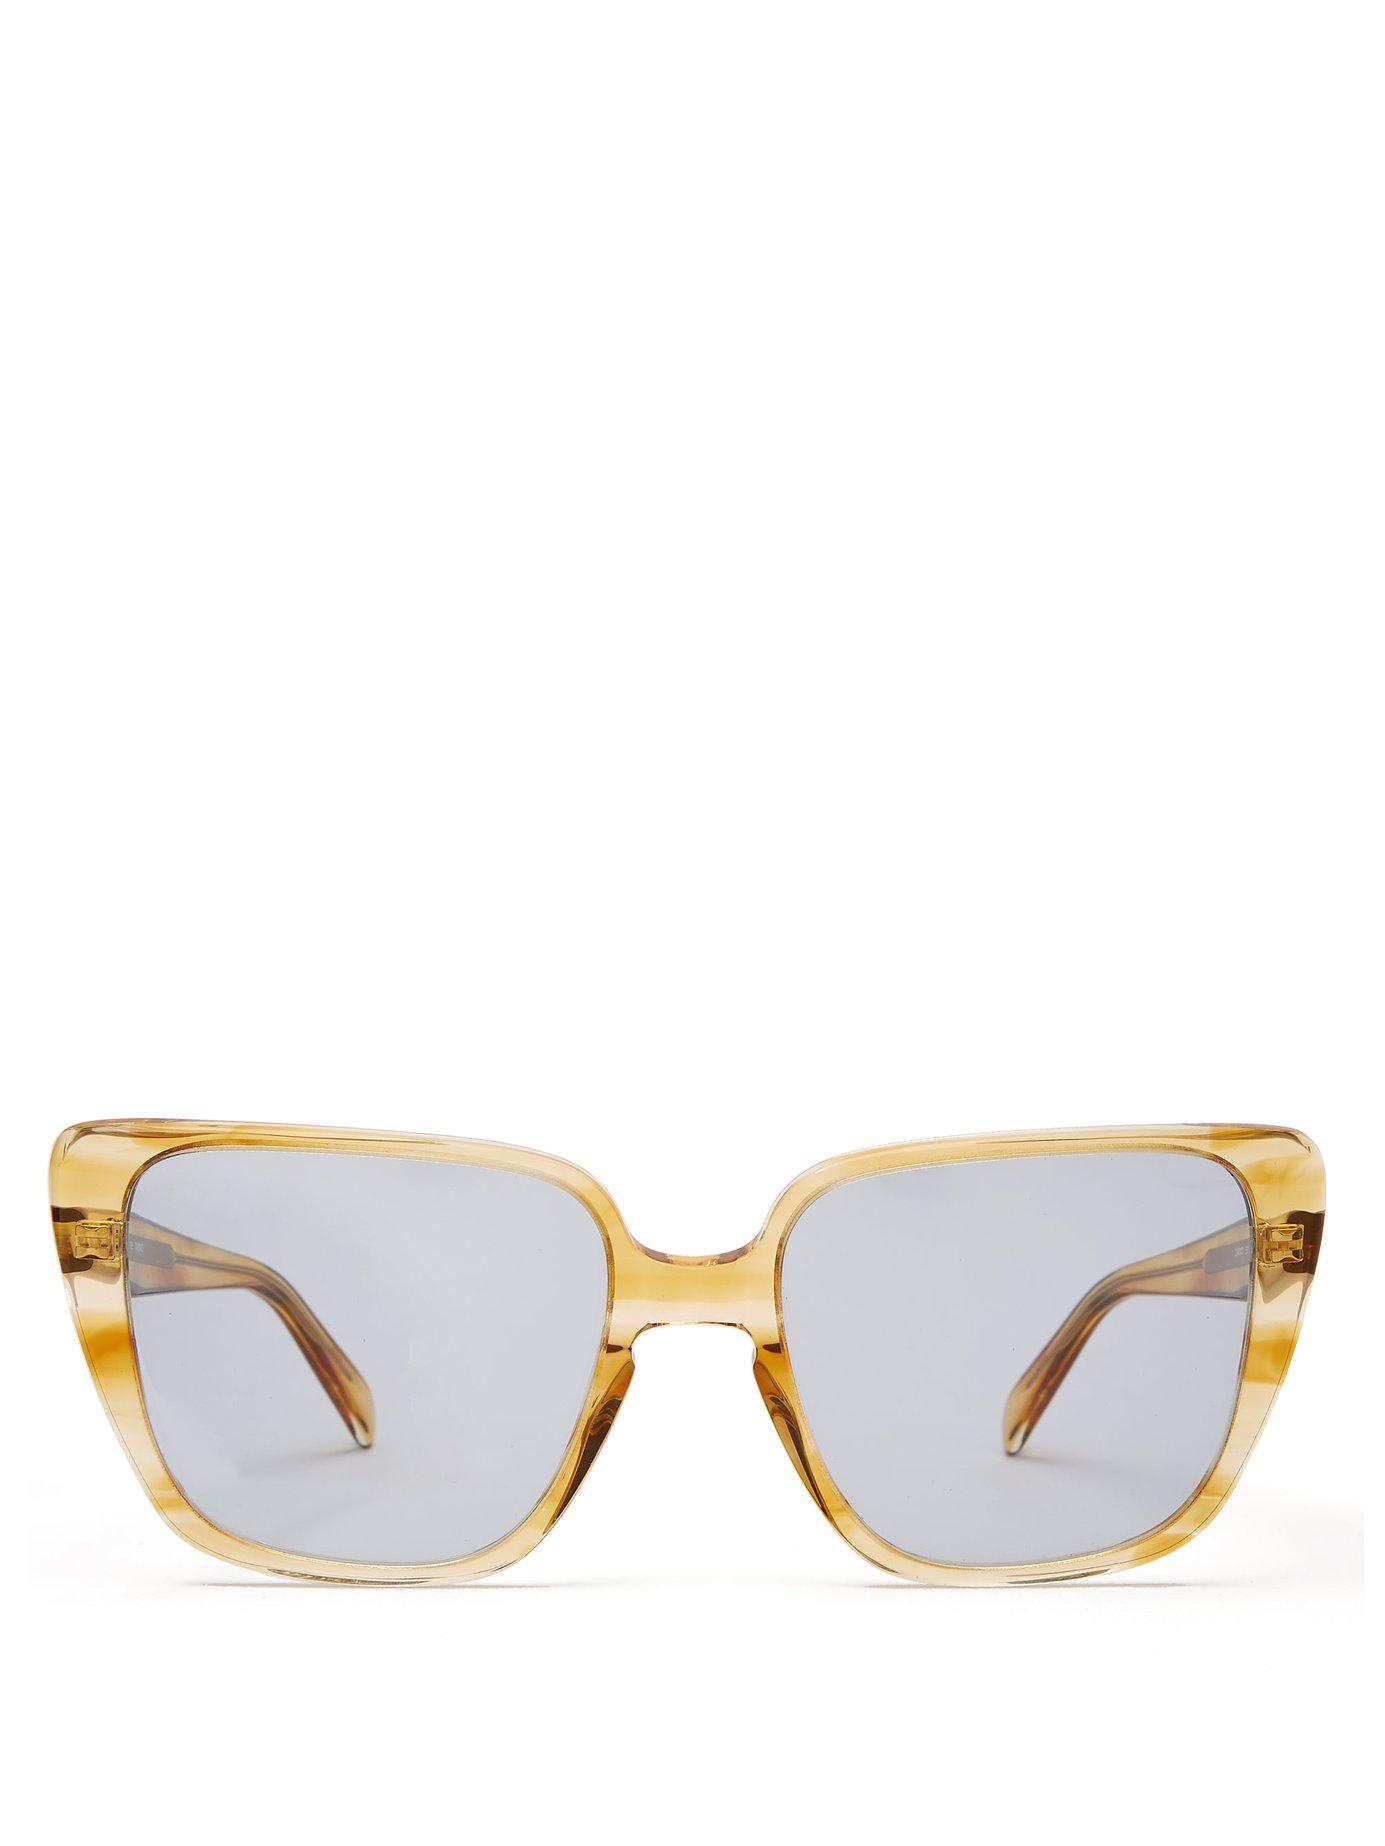 334799b3b8cc Céline. Women s Square Cat Eye Acetate Sunglasses